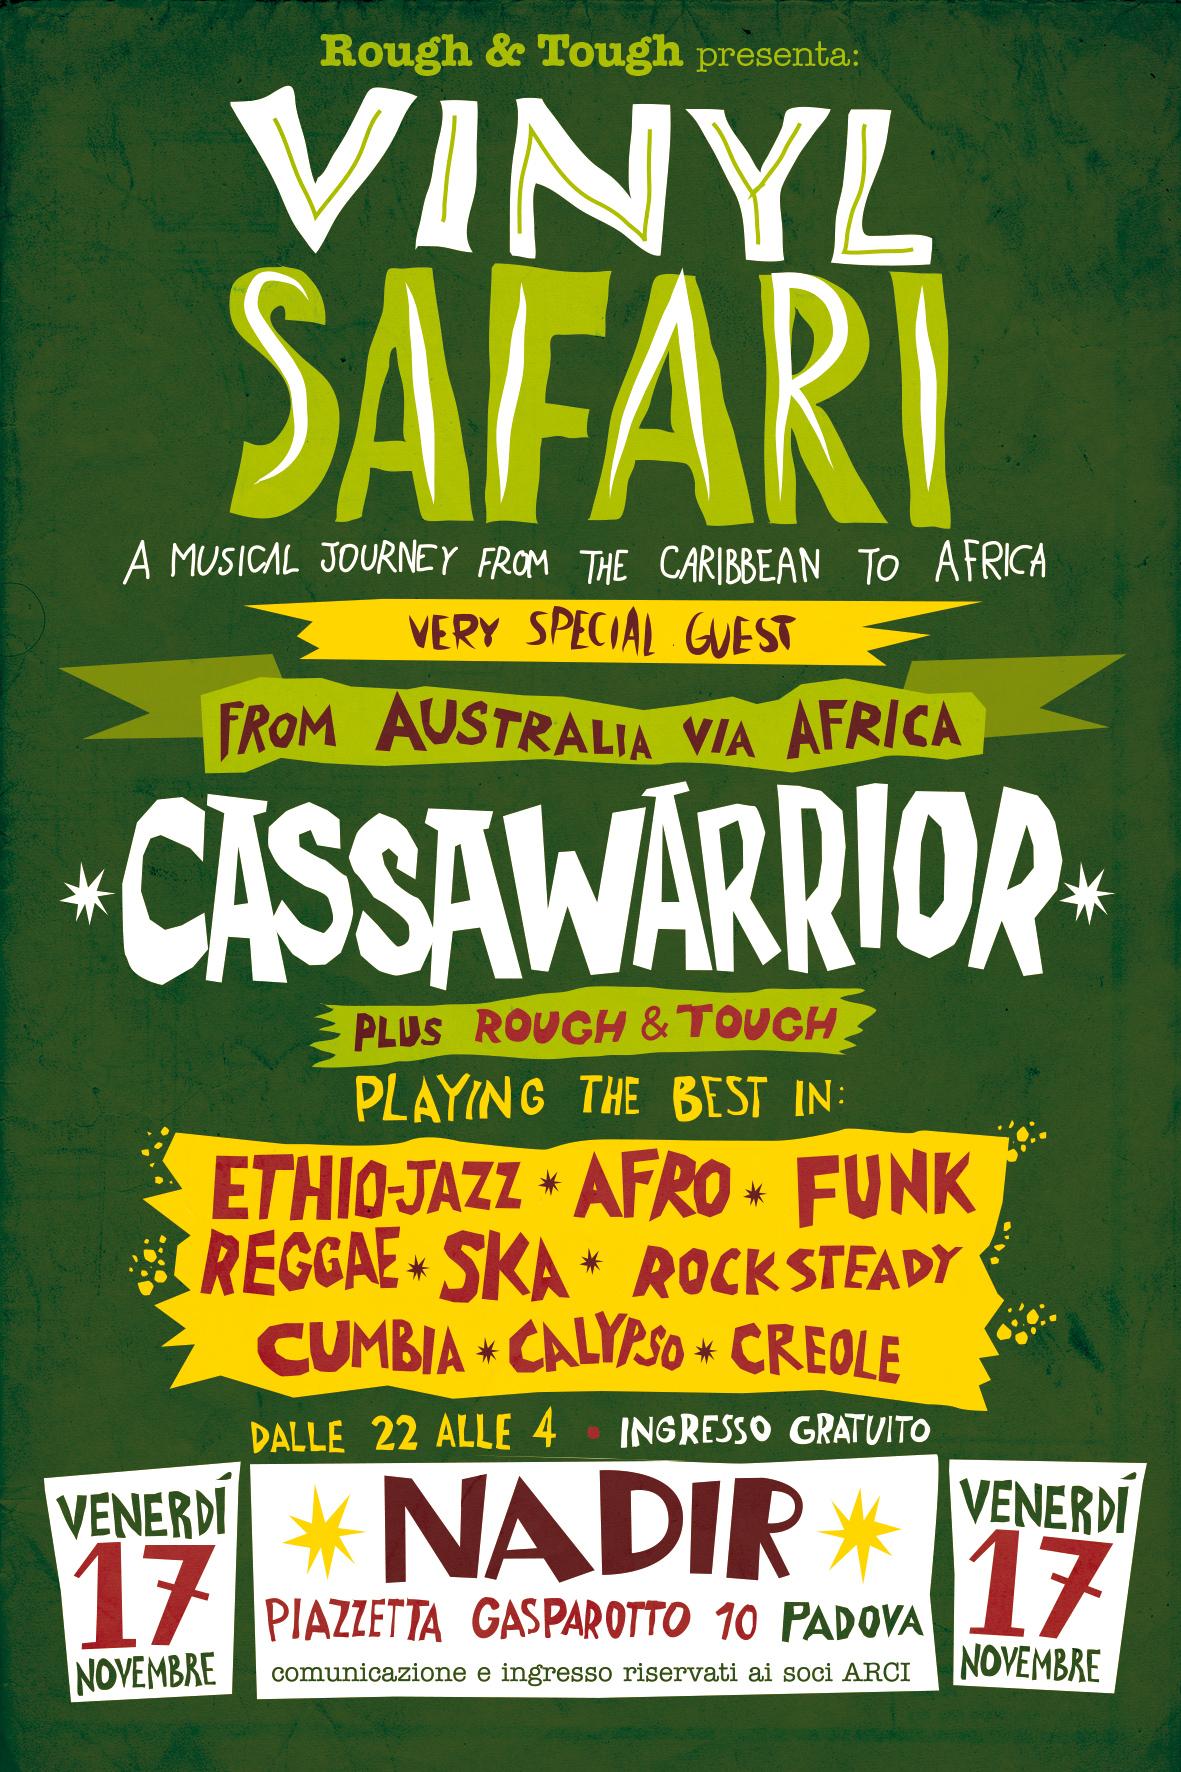 vinyl safari, serata musica africana reggae latina, venerdì 17 novembre 2017 a Padova